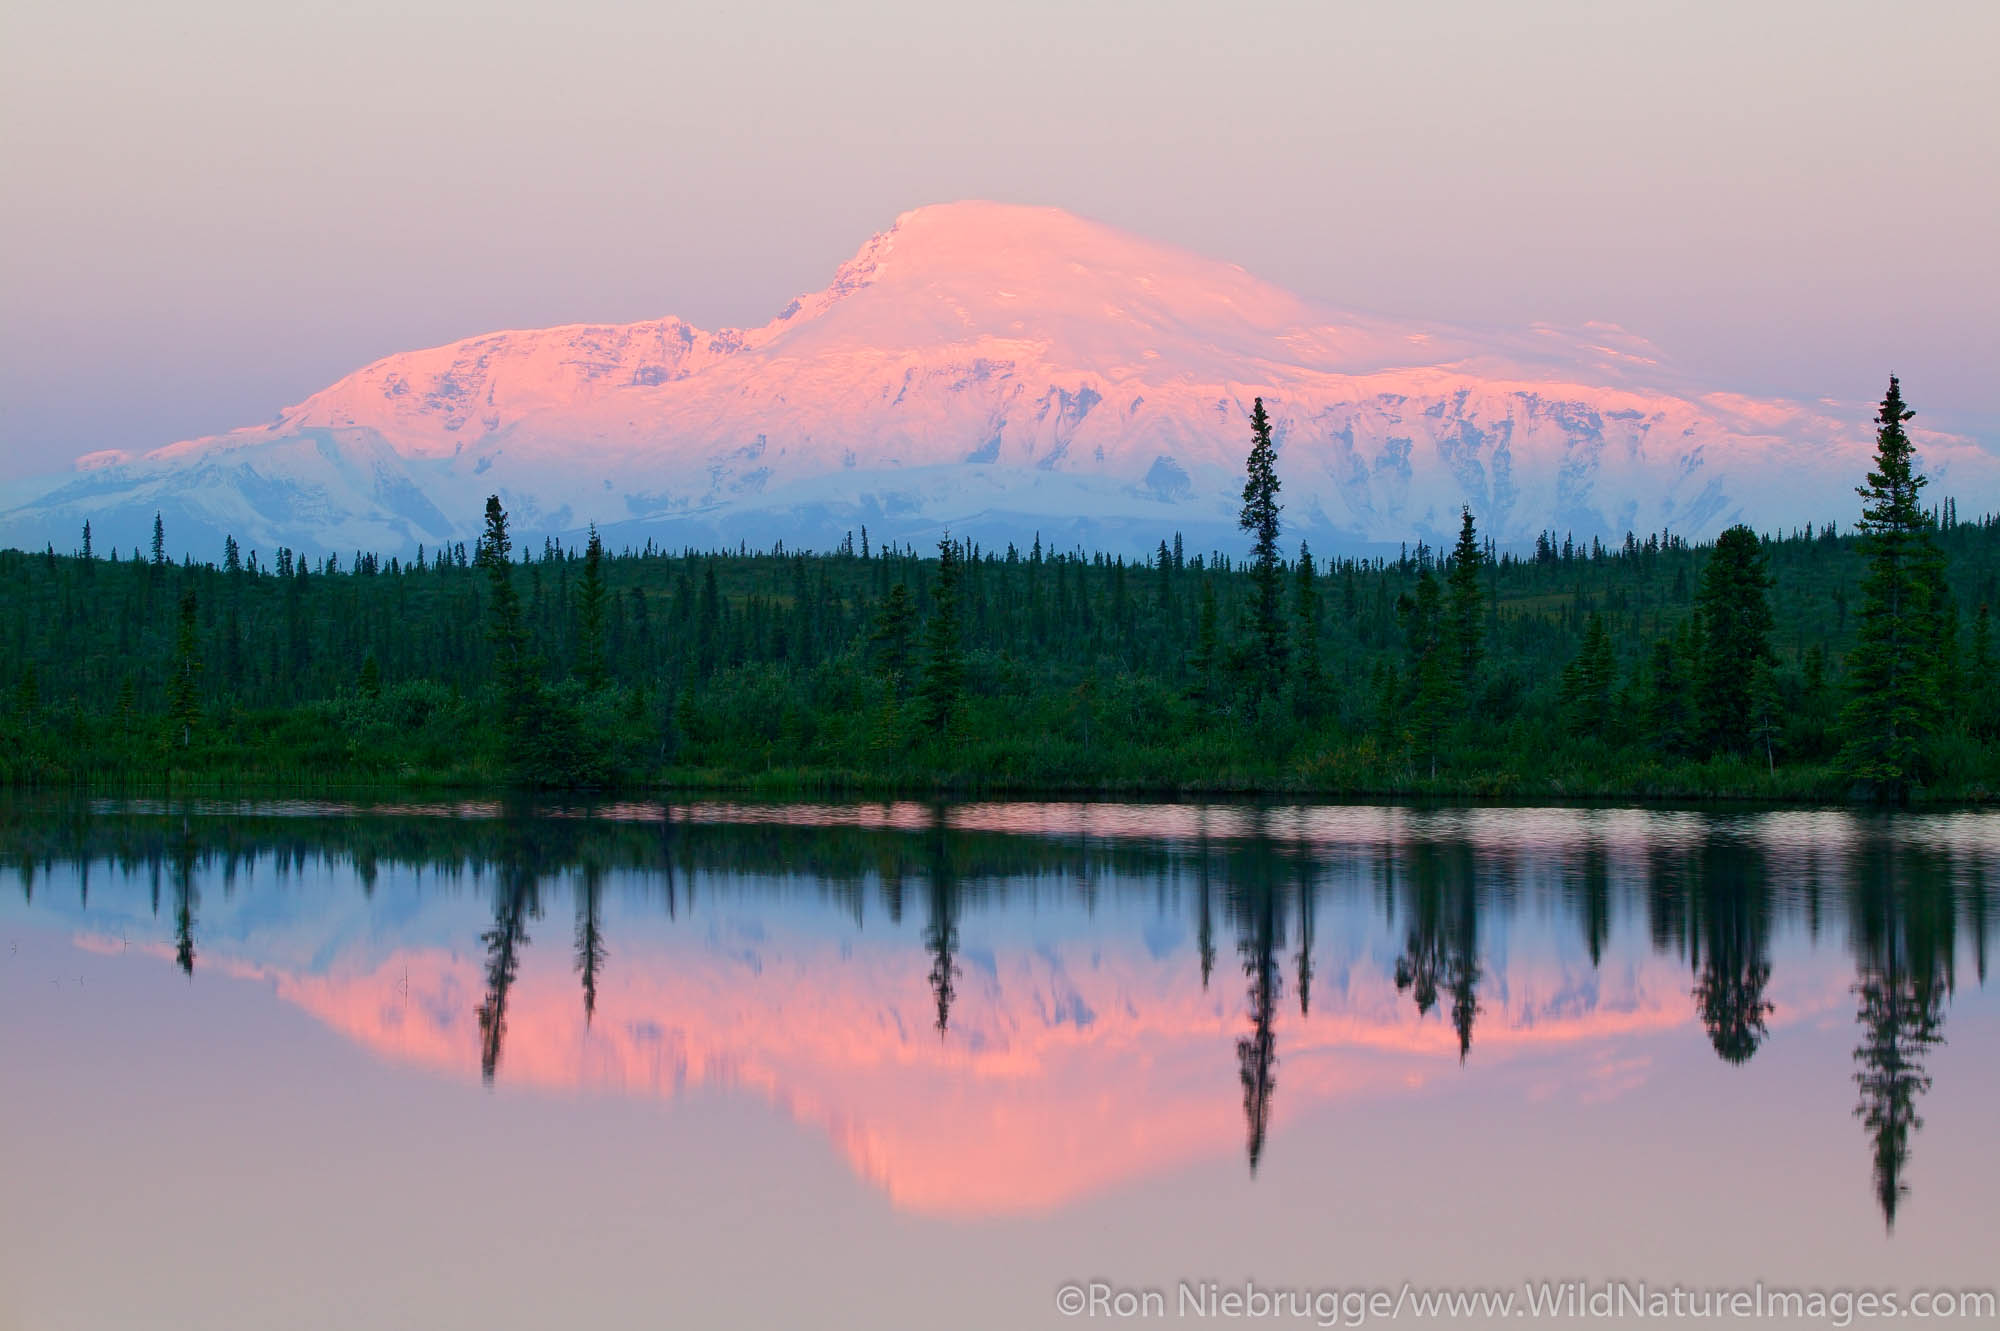 Mt. Sanford (16,237 feet) at sunrise from Rock Lake along the Nabesna Road, Wrangell-St Elias National Park, Alaska.